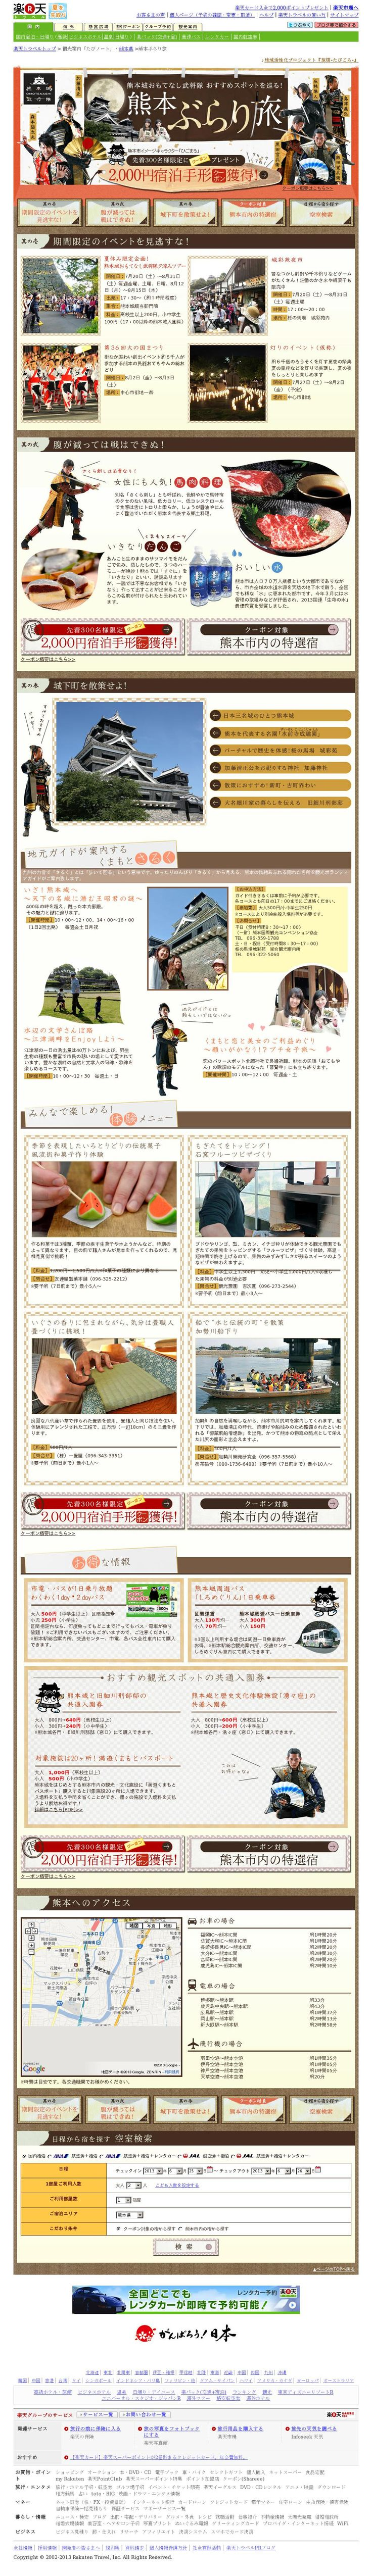 【D】【旅頃】熊本おもてなし武将隊<2013/06/03>